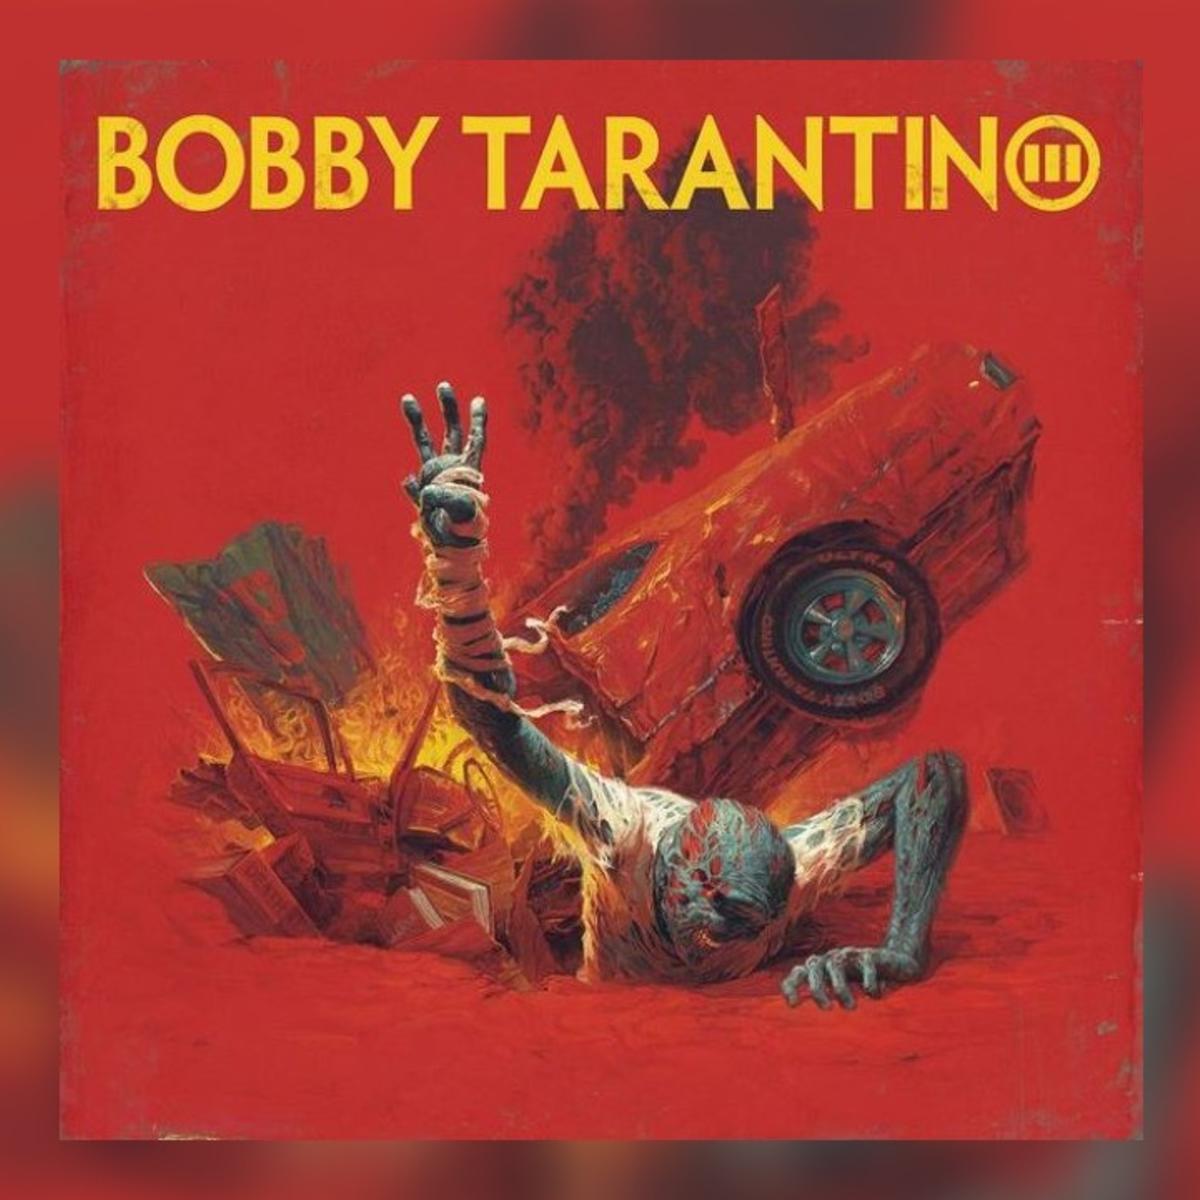 Logic – 'Bobby Tarantino III' (Stream)